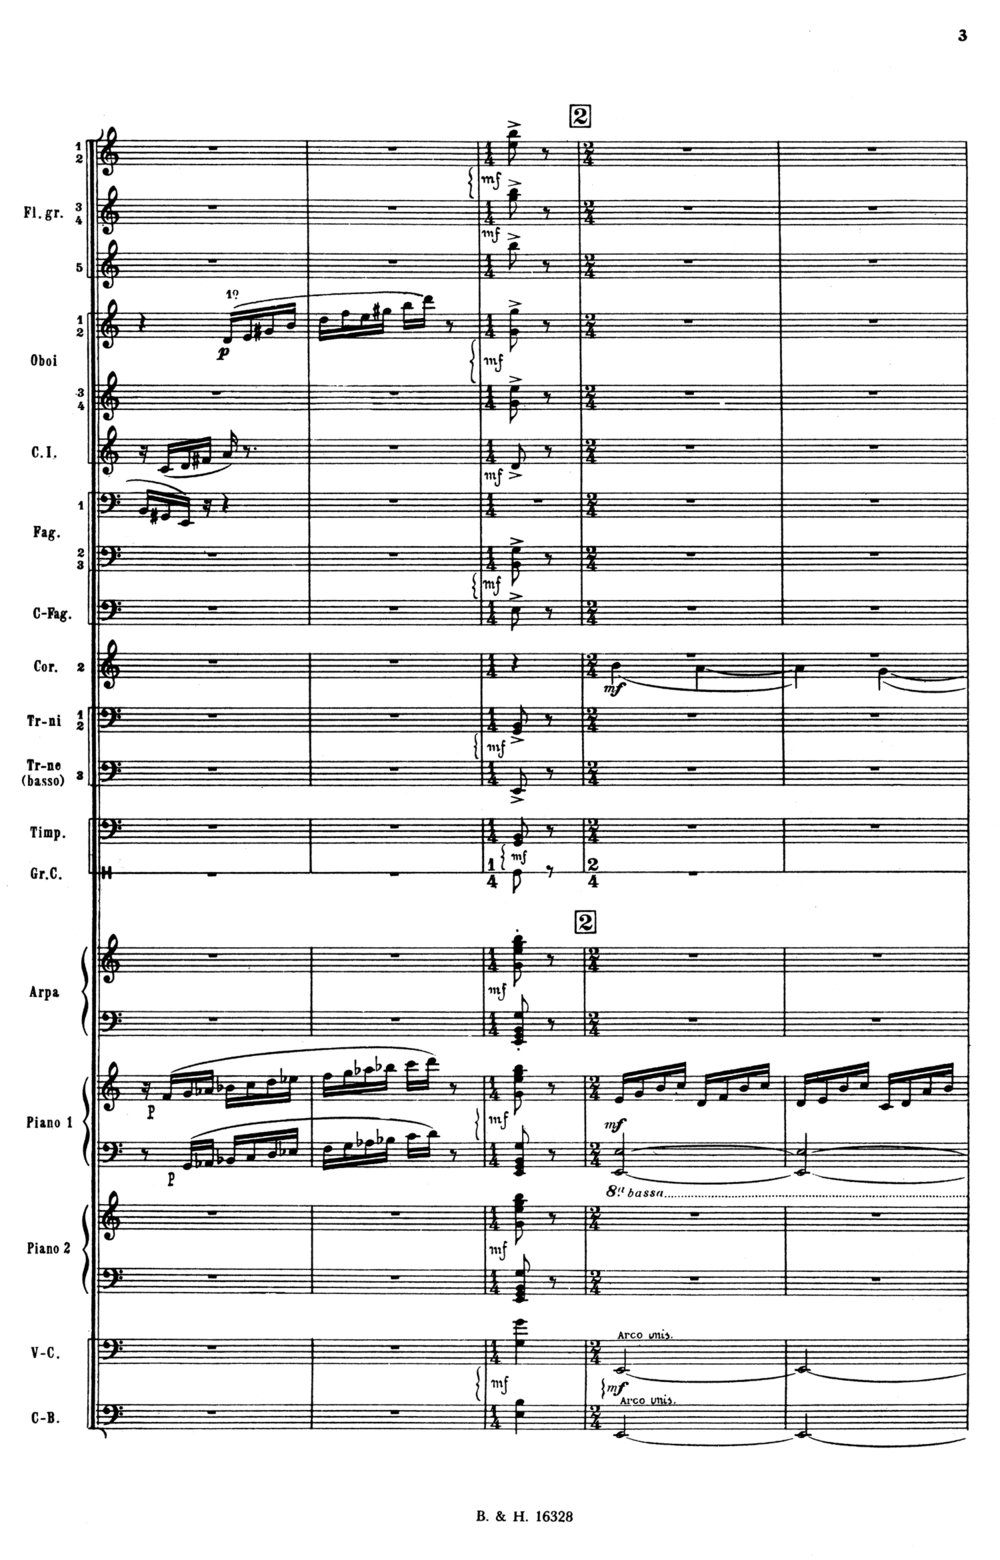 Stravinsky Psalms Score 3.jpg